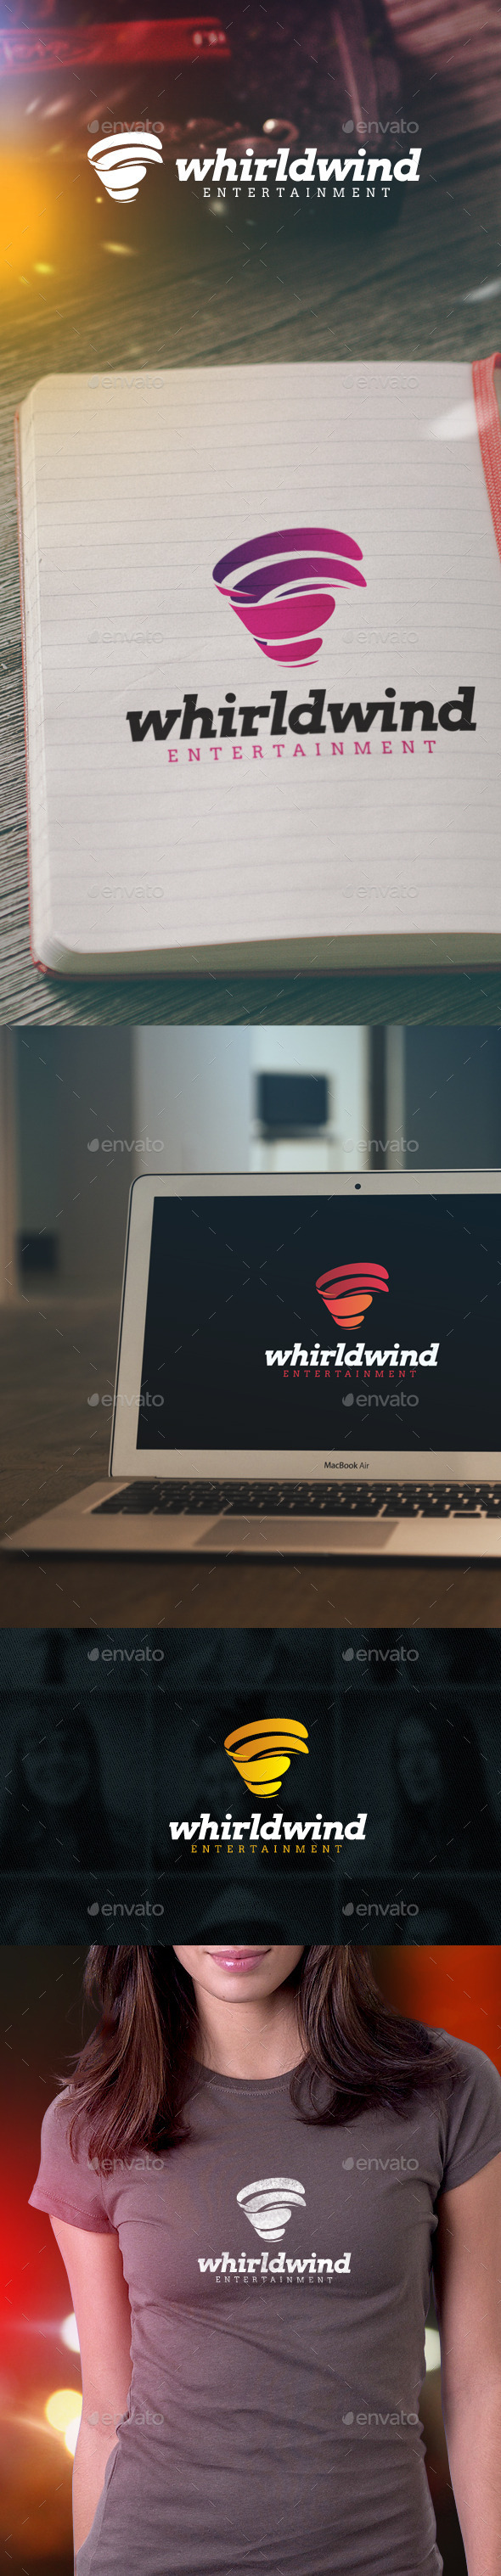 Whirlwind Entertainment Logo - Symbols Logo Templates